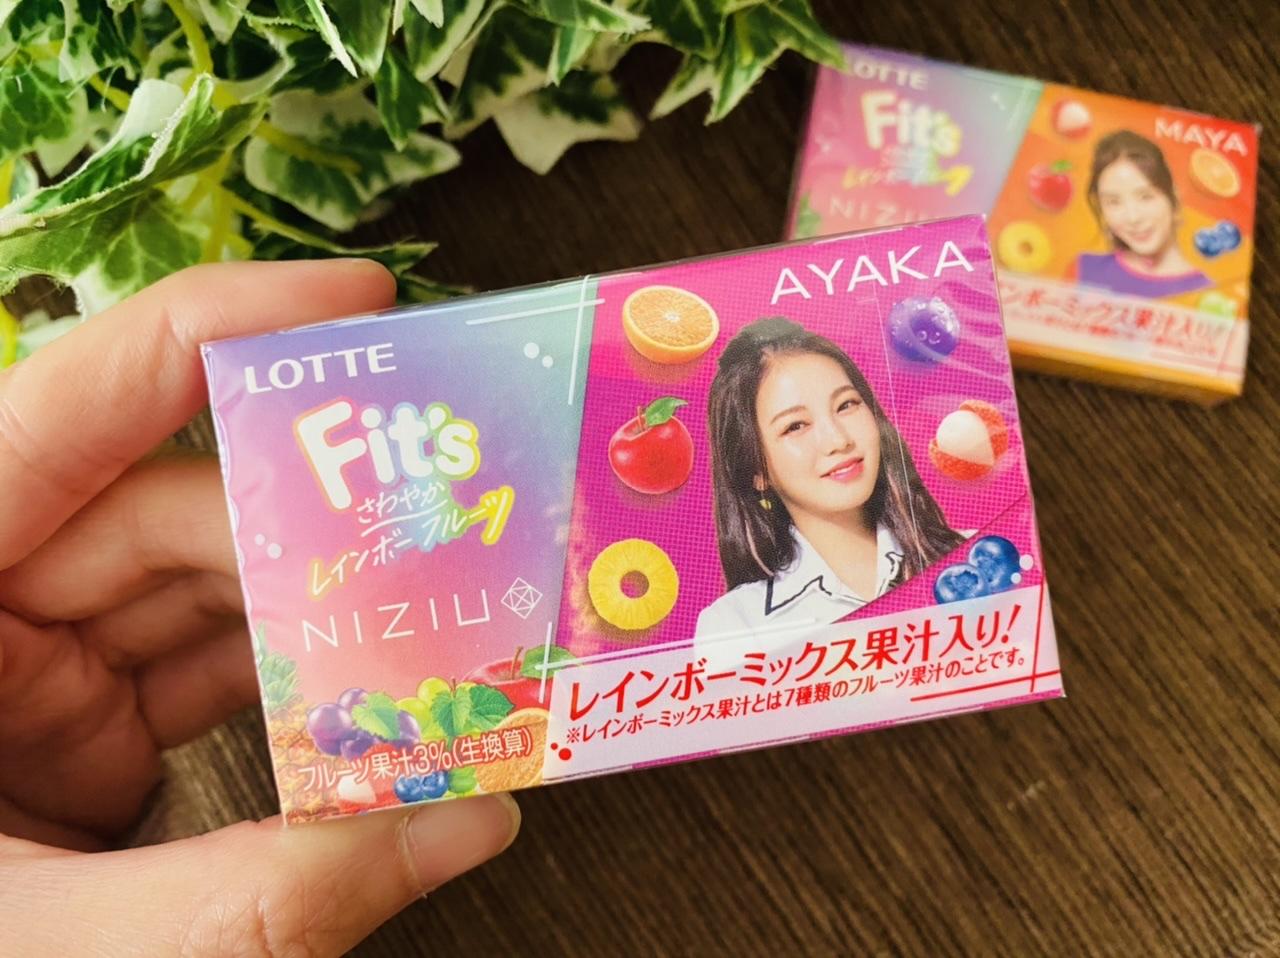 【NiziU× Fit's】パケ買い必至★全メンバー揃えたい!《コラボガム》が可愛すぎ♡_3